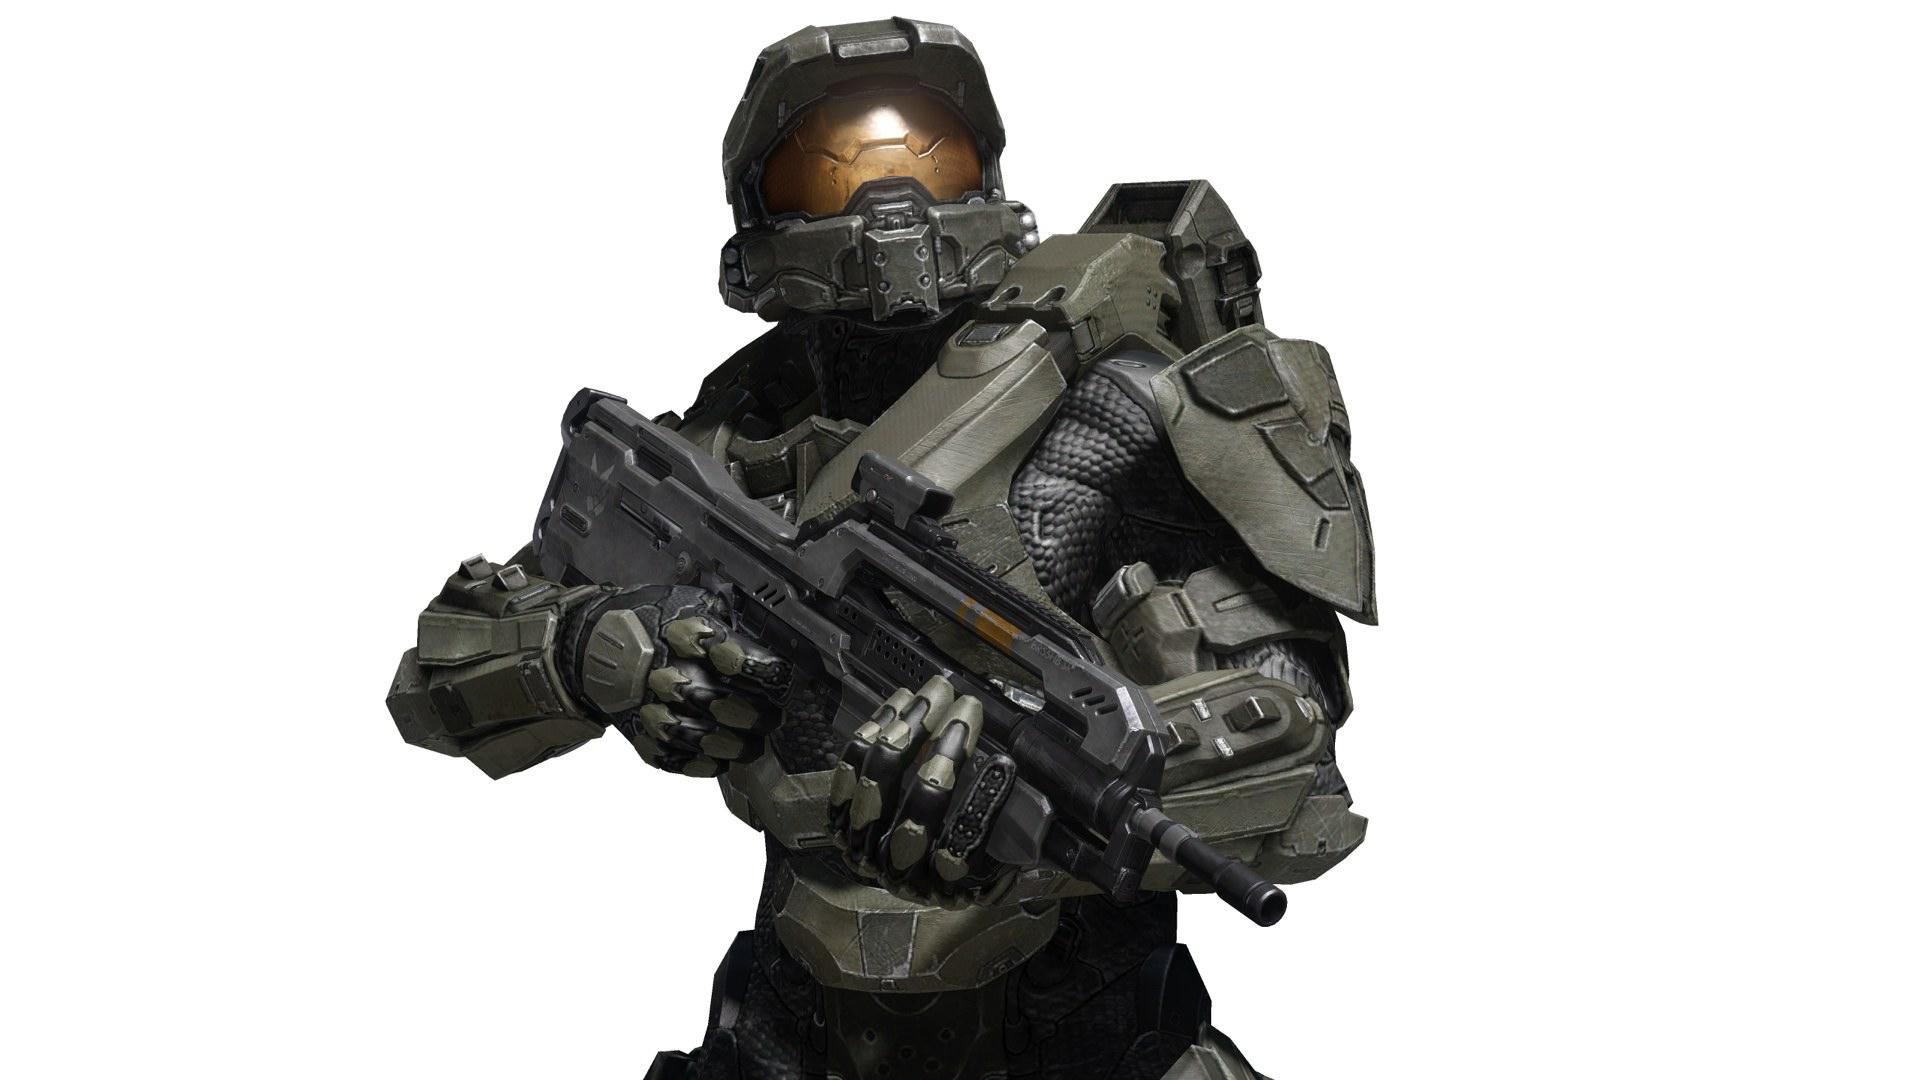 costume iron man mark 7